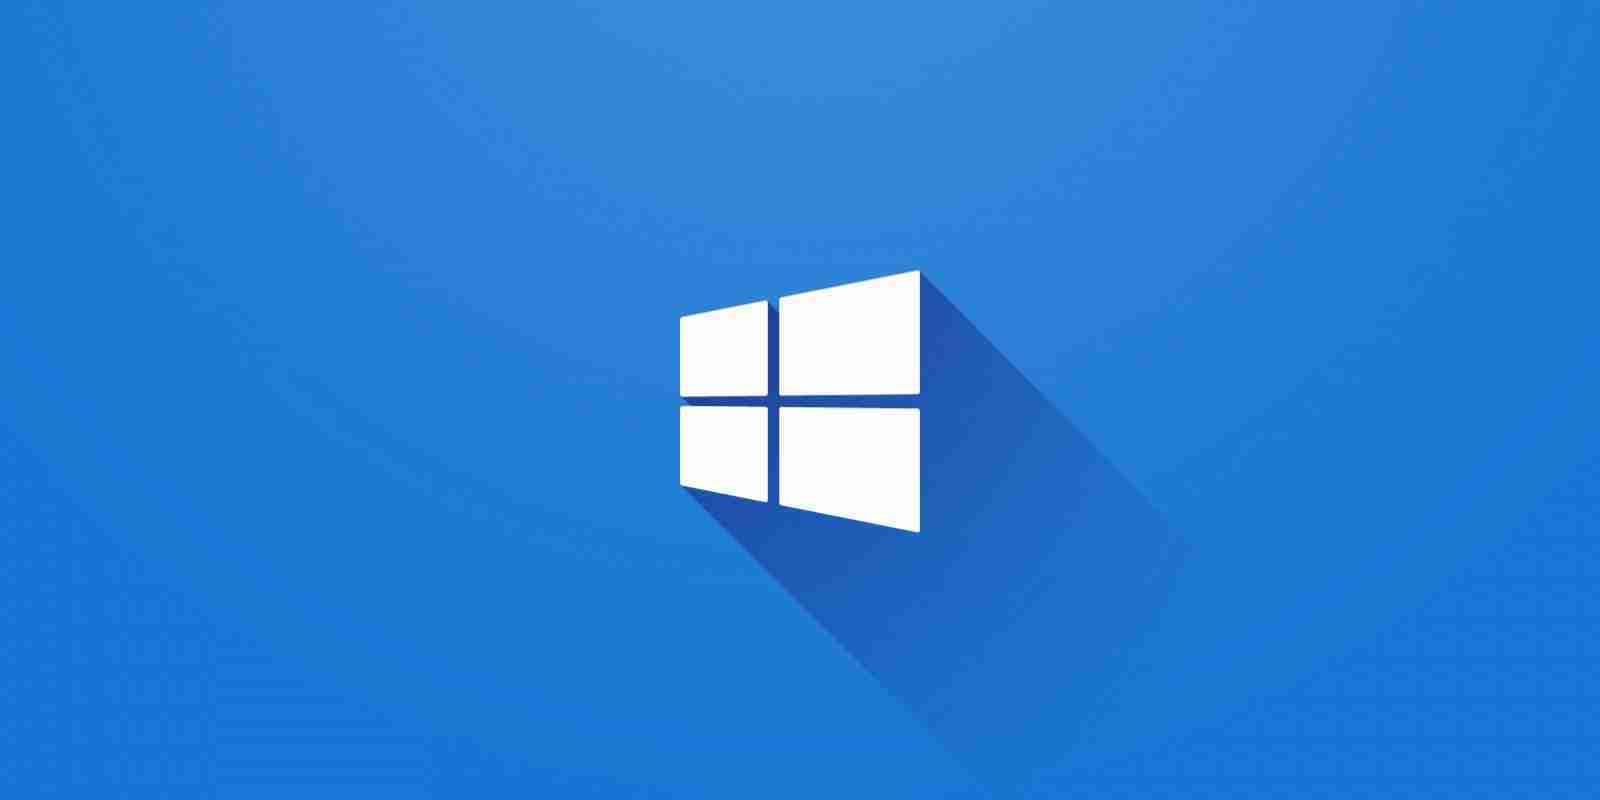 Microsoft Warns Of Ongoing Attacks Using Windows Zerologon Flaw